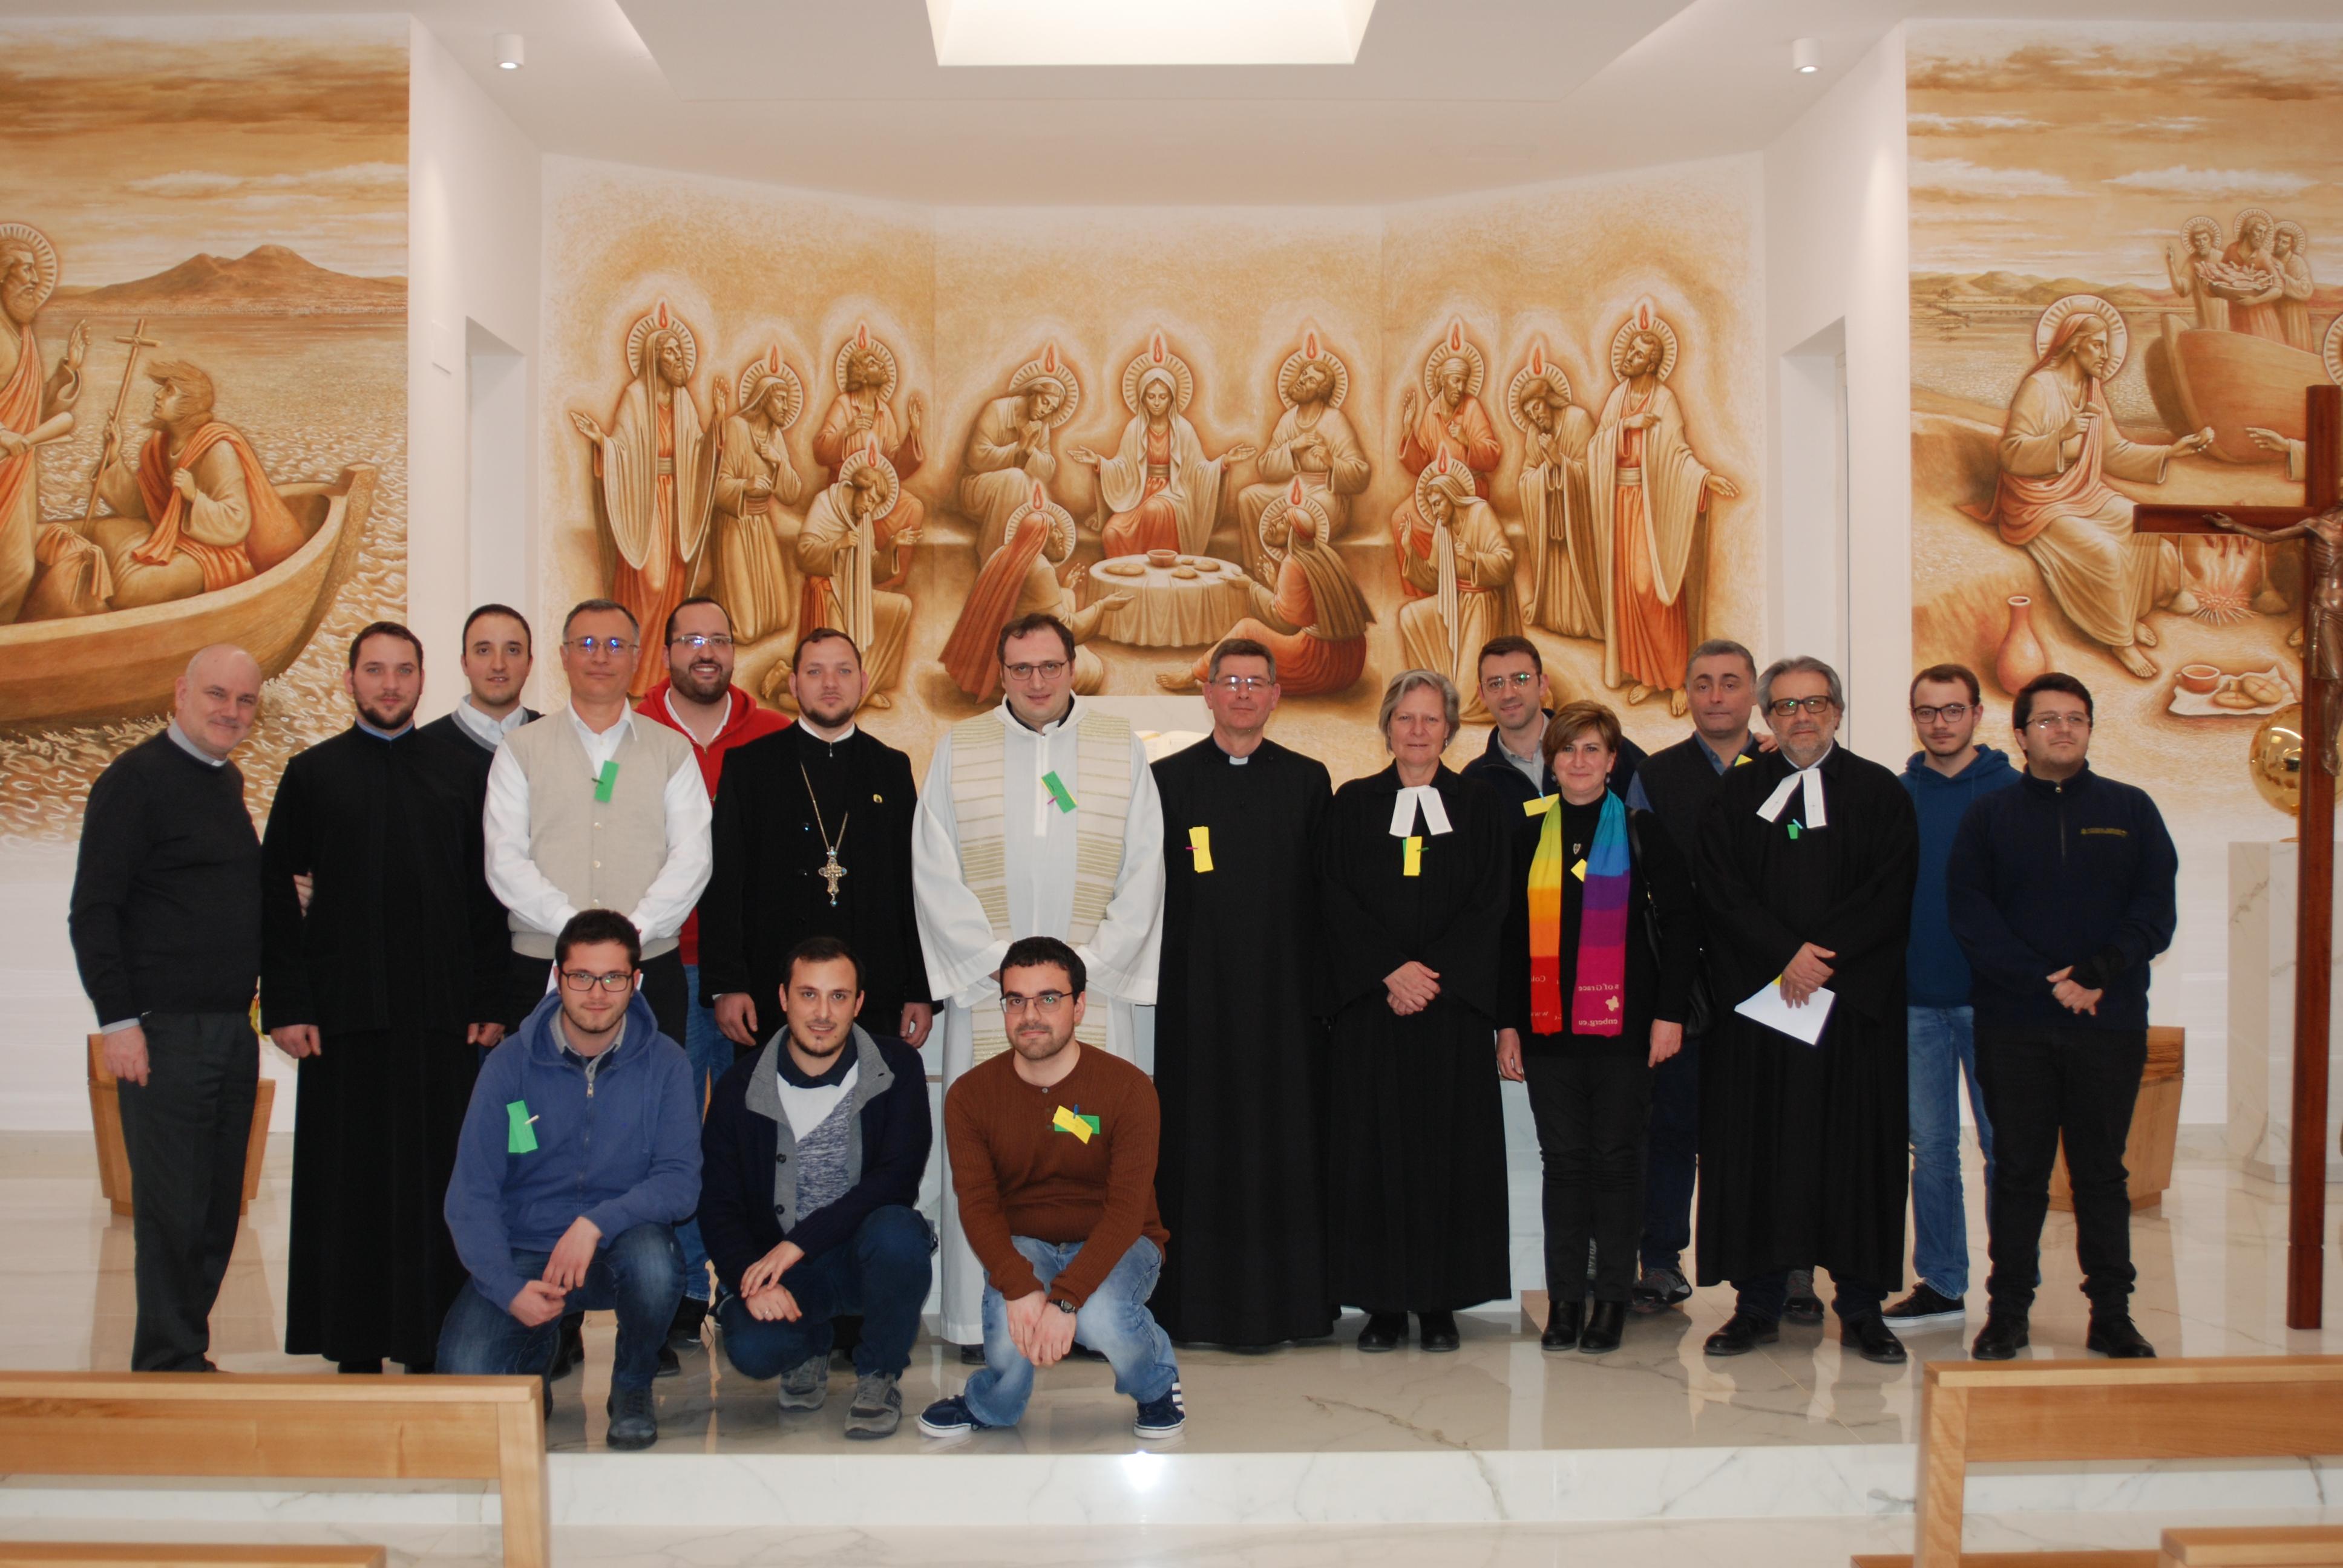 preghiera ecumenica evidenza b